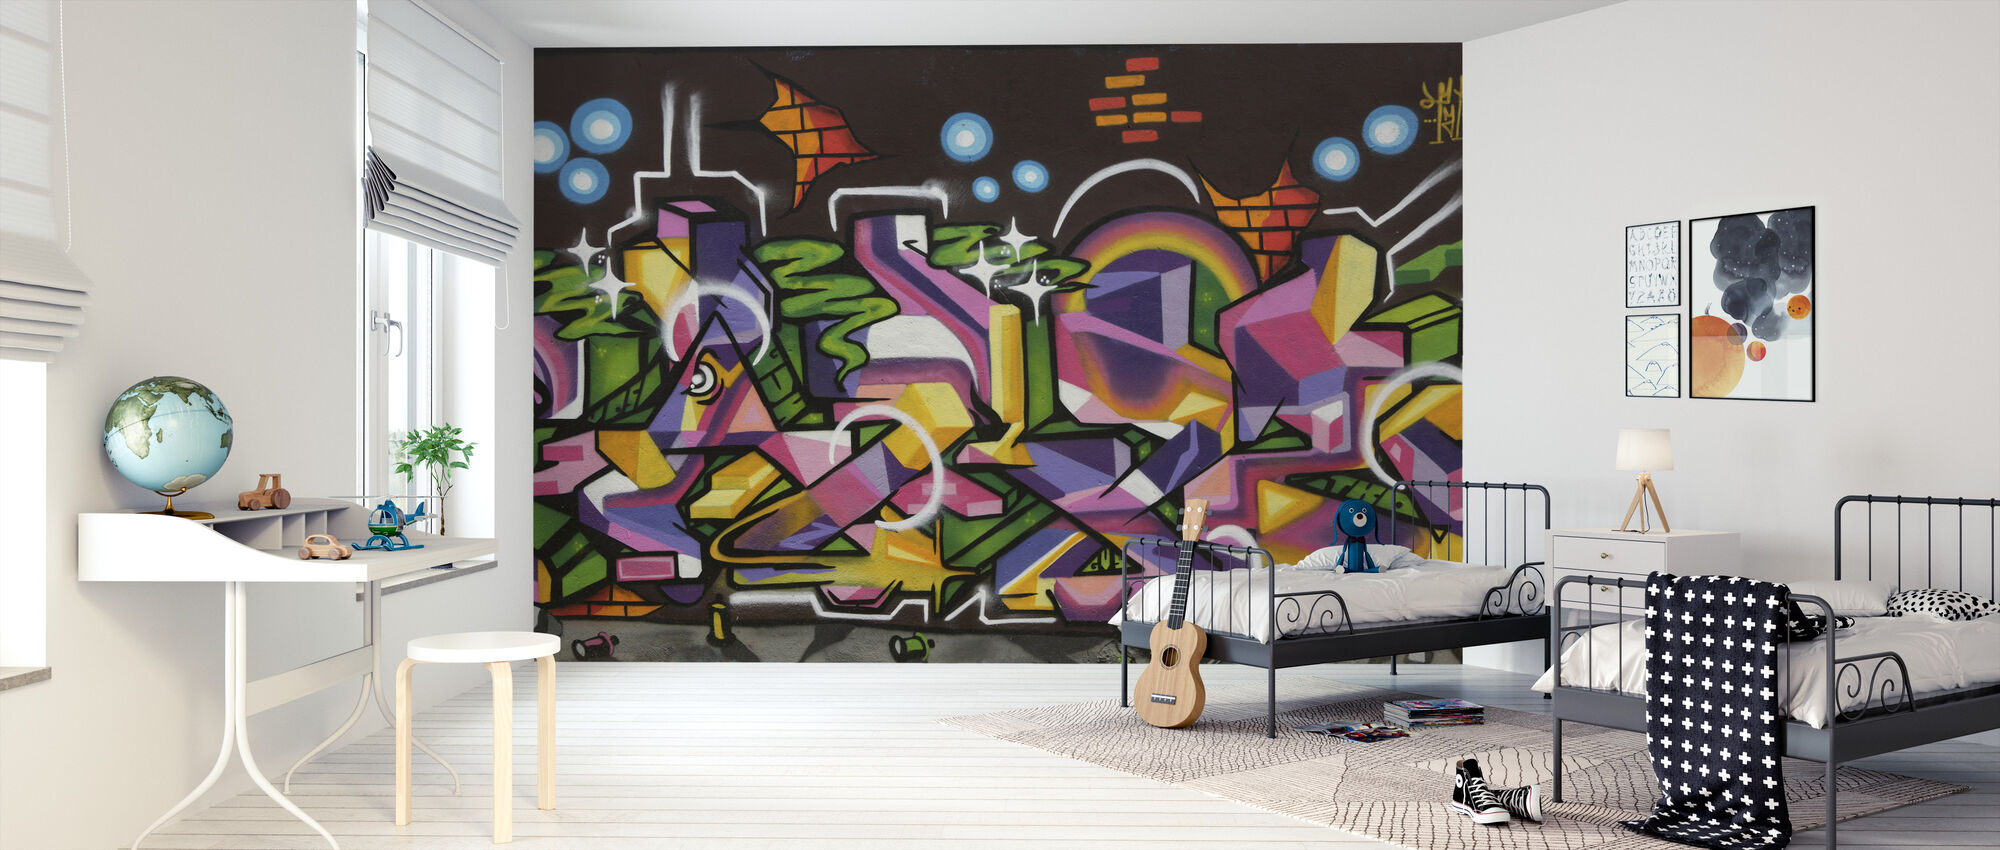 Teenage Graffiti - Tapet - Børneværelse